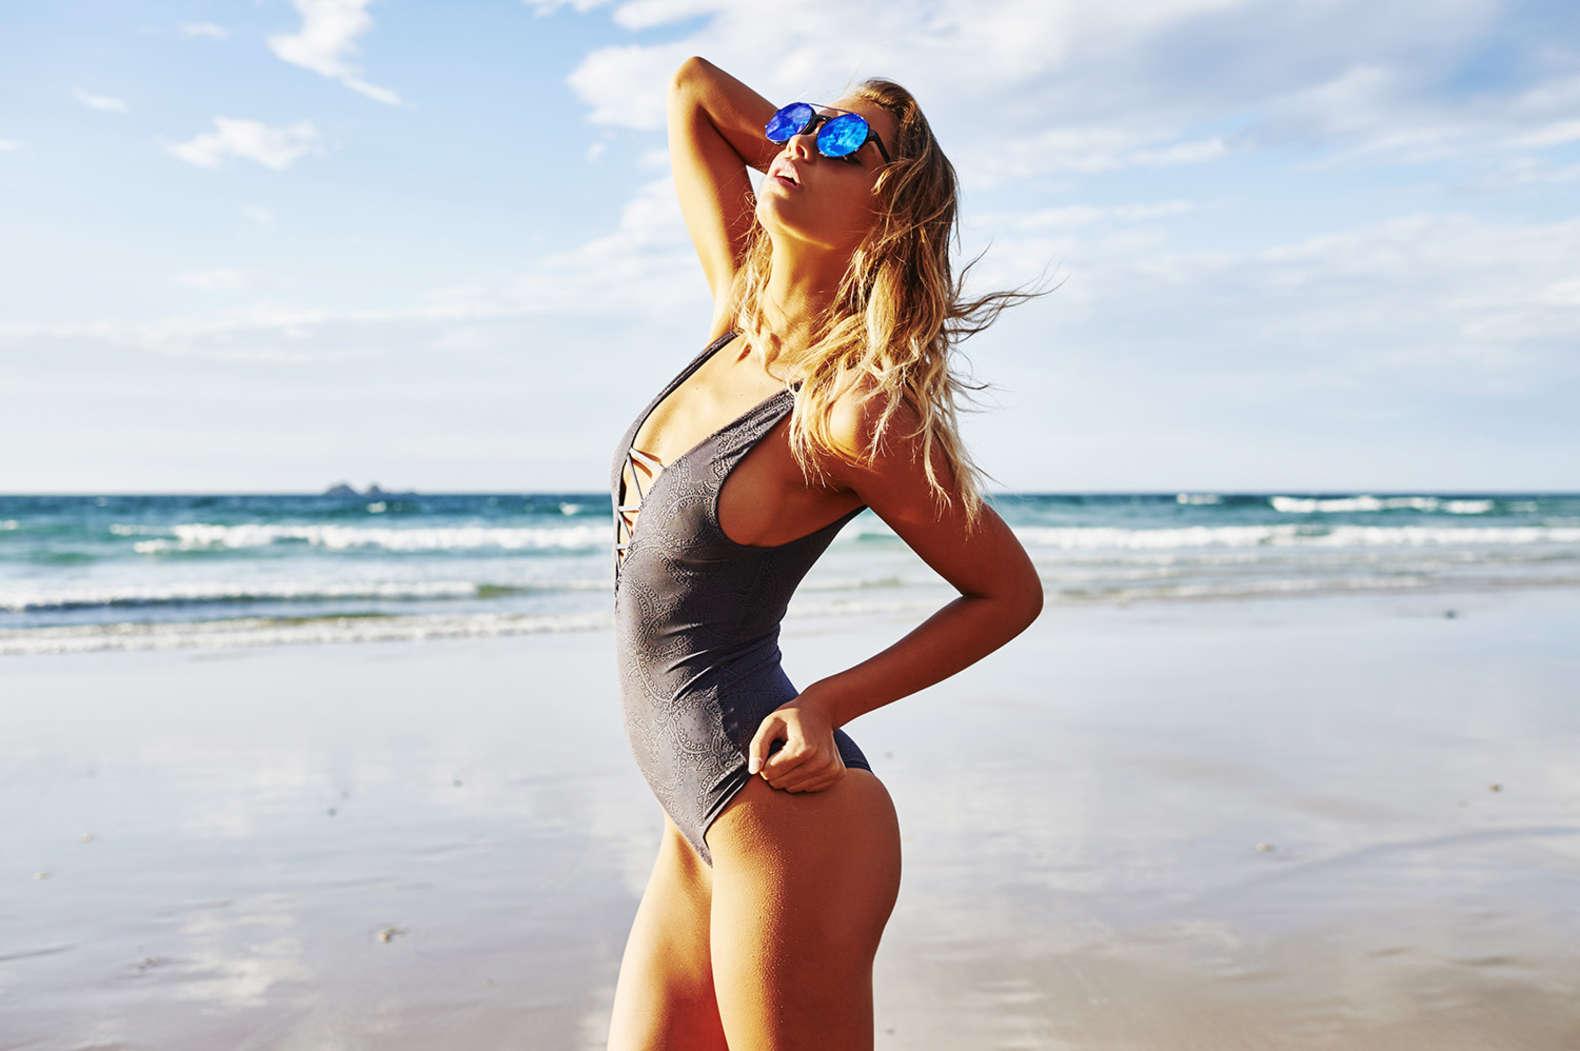 kristina mendonca bikini photoshoot 06   gotceleb